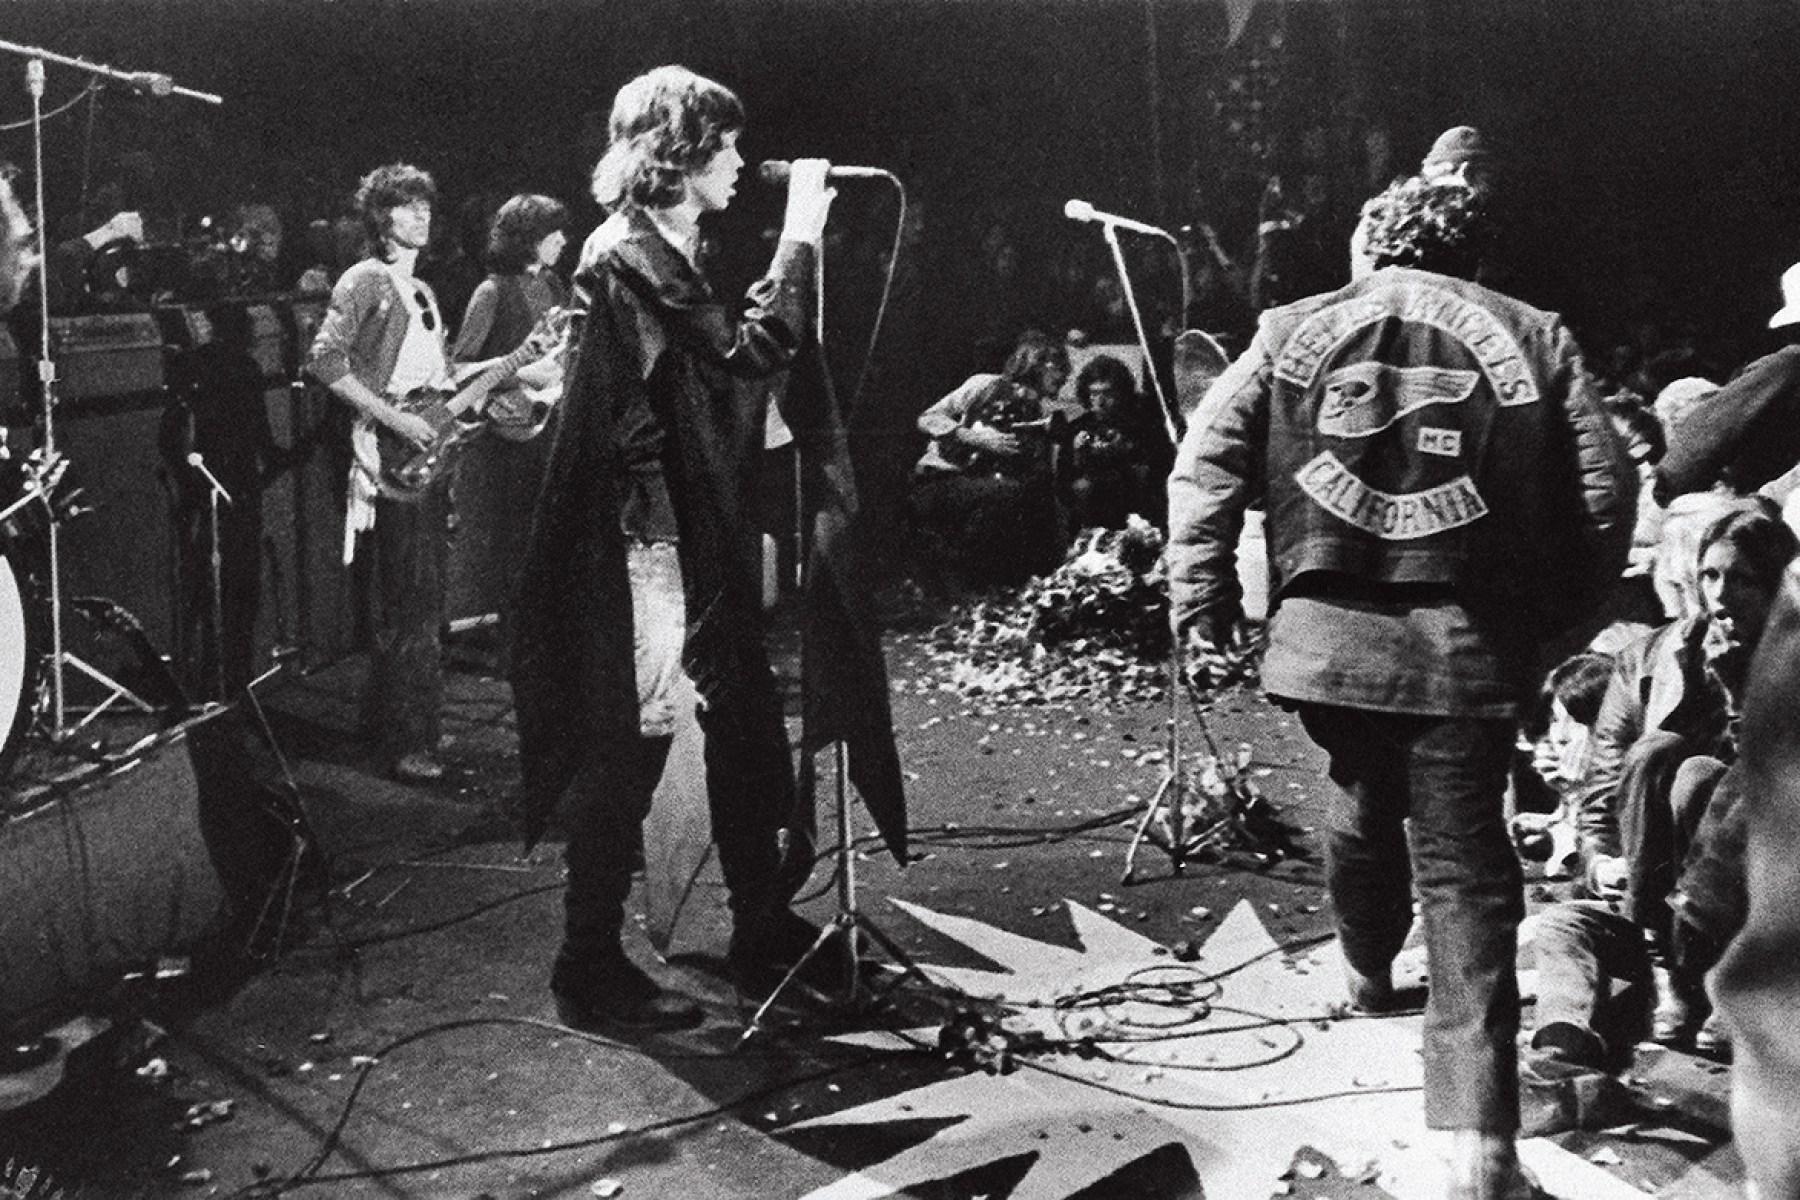 altamont, altamont music festival, altamont 1969, altamont book, altamont hells angels, altamont murder, hells angels murder